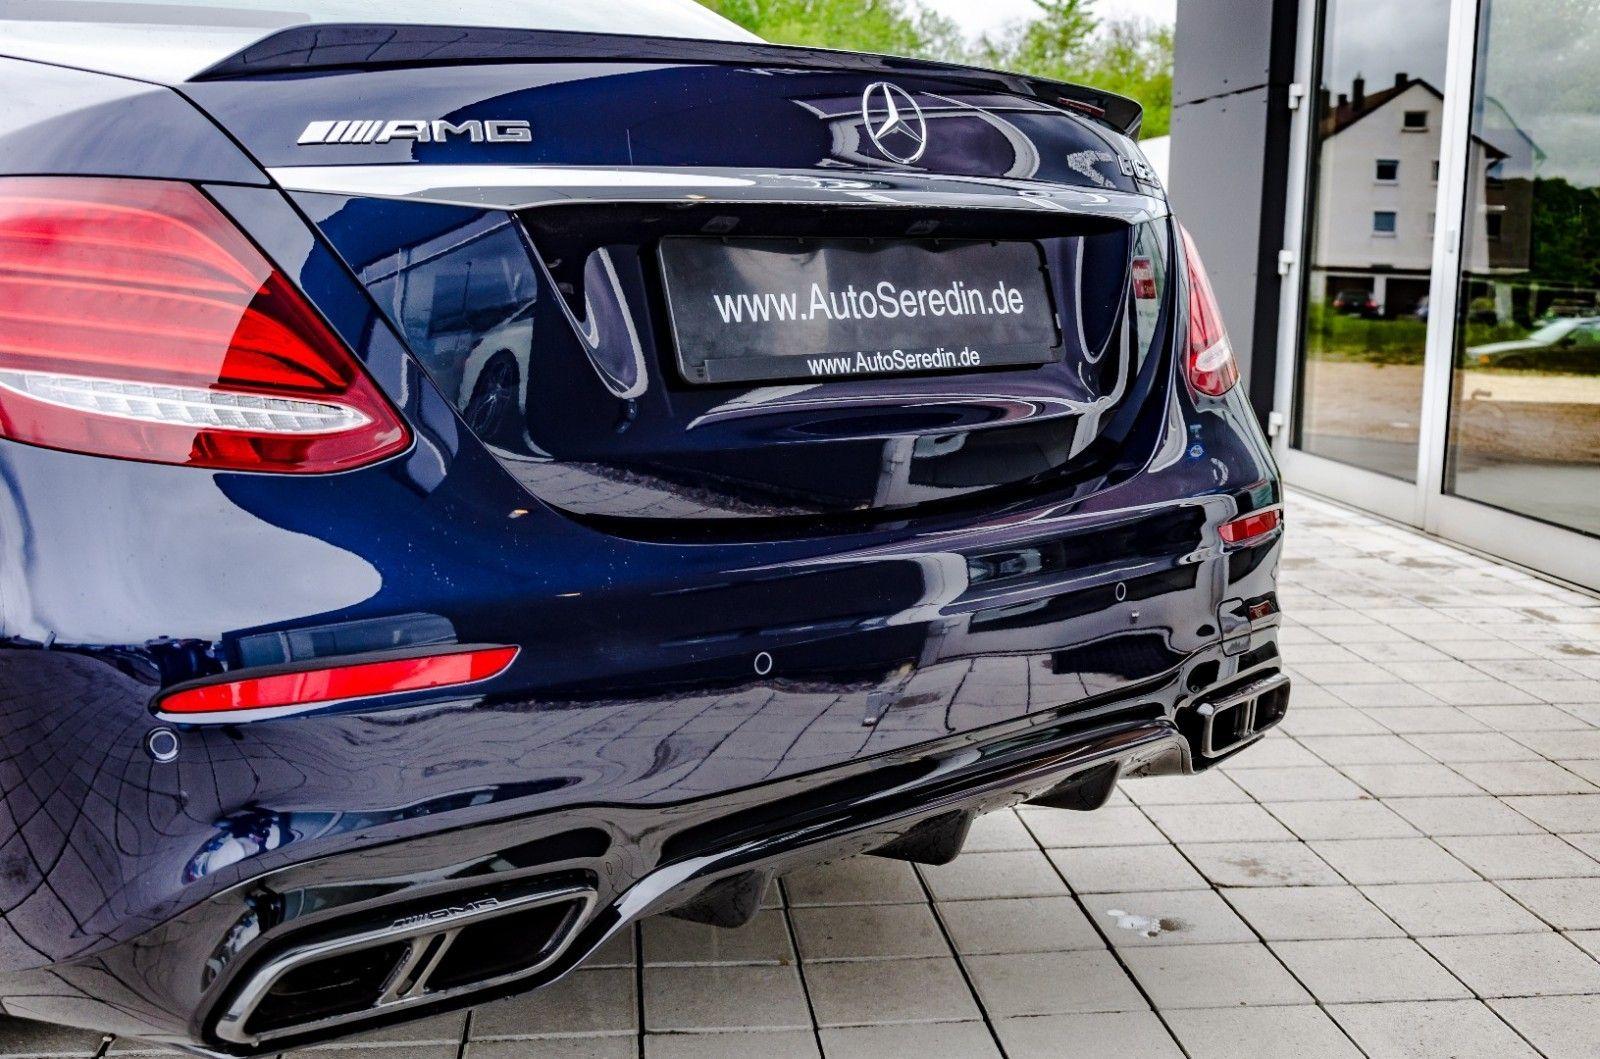 Mercedes Benz E 63 Amg S 4m Brabus Perform Seats Carbon Burmester Export Price 148 750 Stosk 1478 Fuel Consumptio Mercedes Benz Mercedes Benz